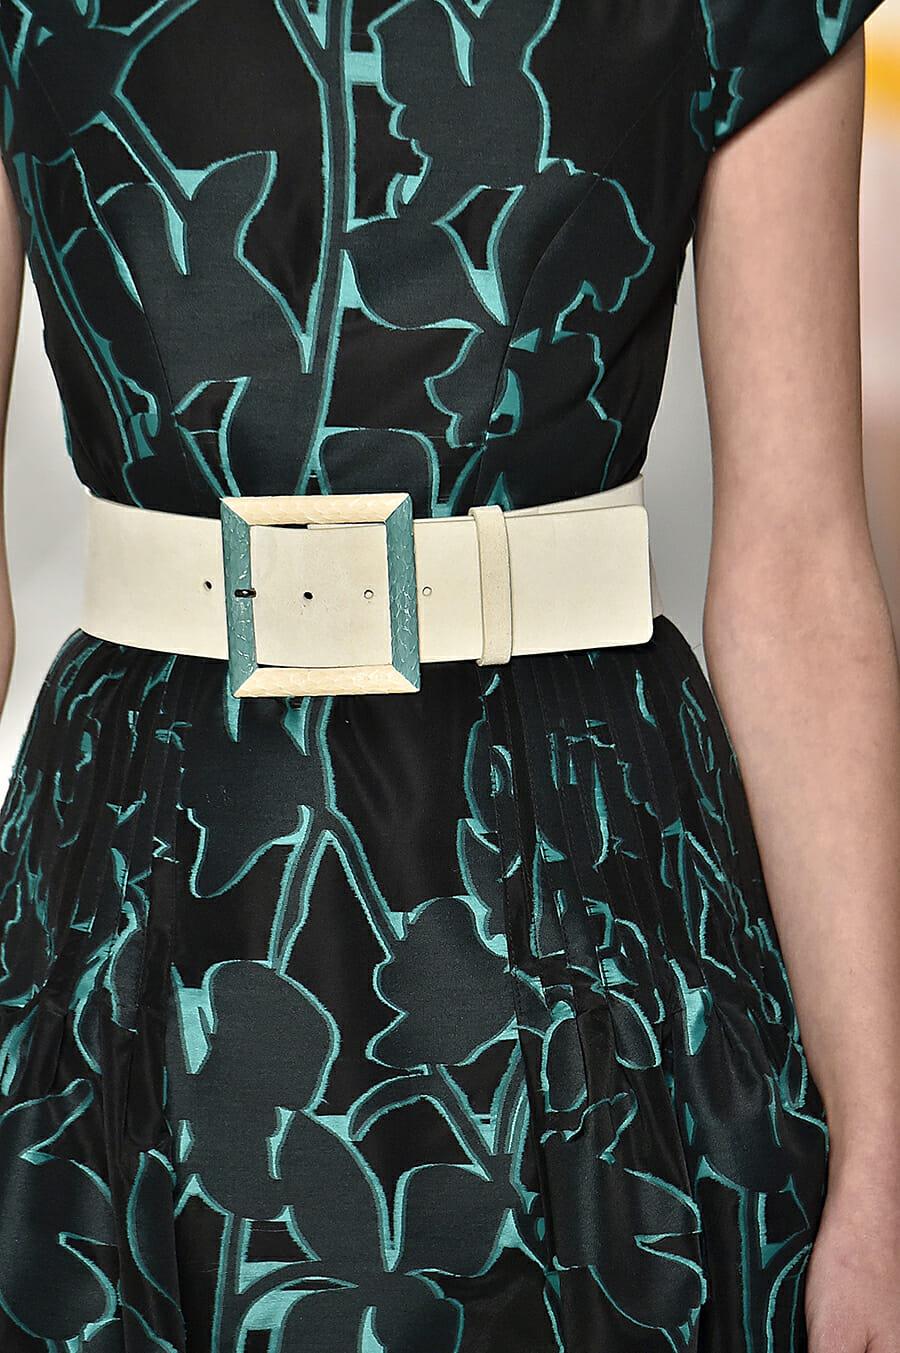 Carolina-Herrera-New-York-Fashion-Week-Spring-Summer-2018-NY-September-2017-look23-detail1